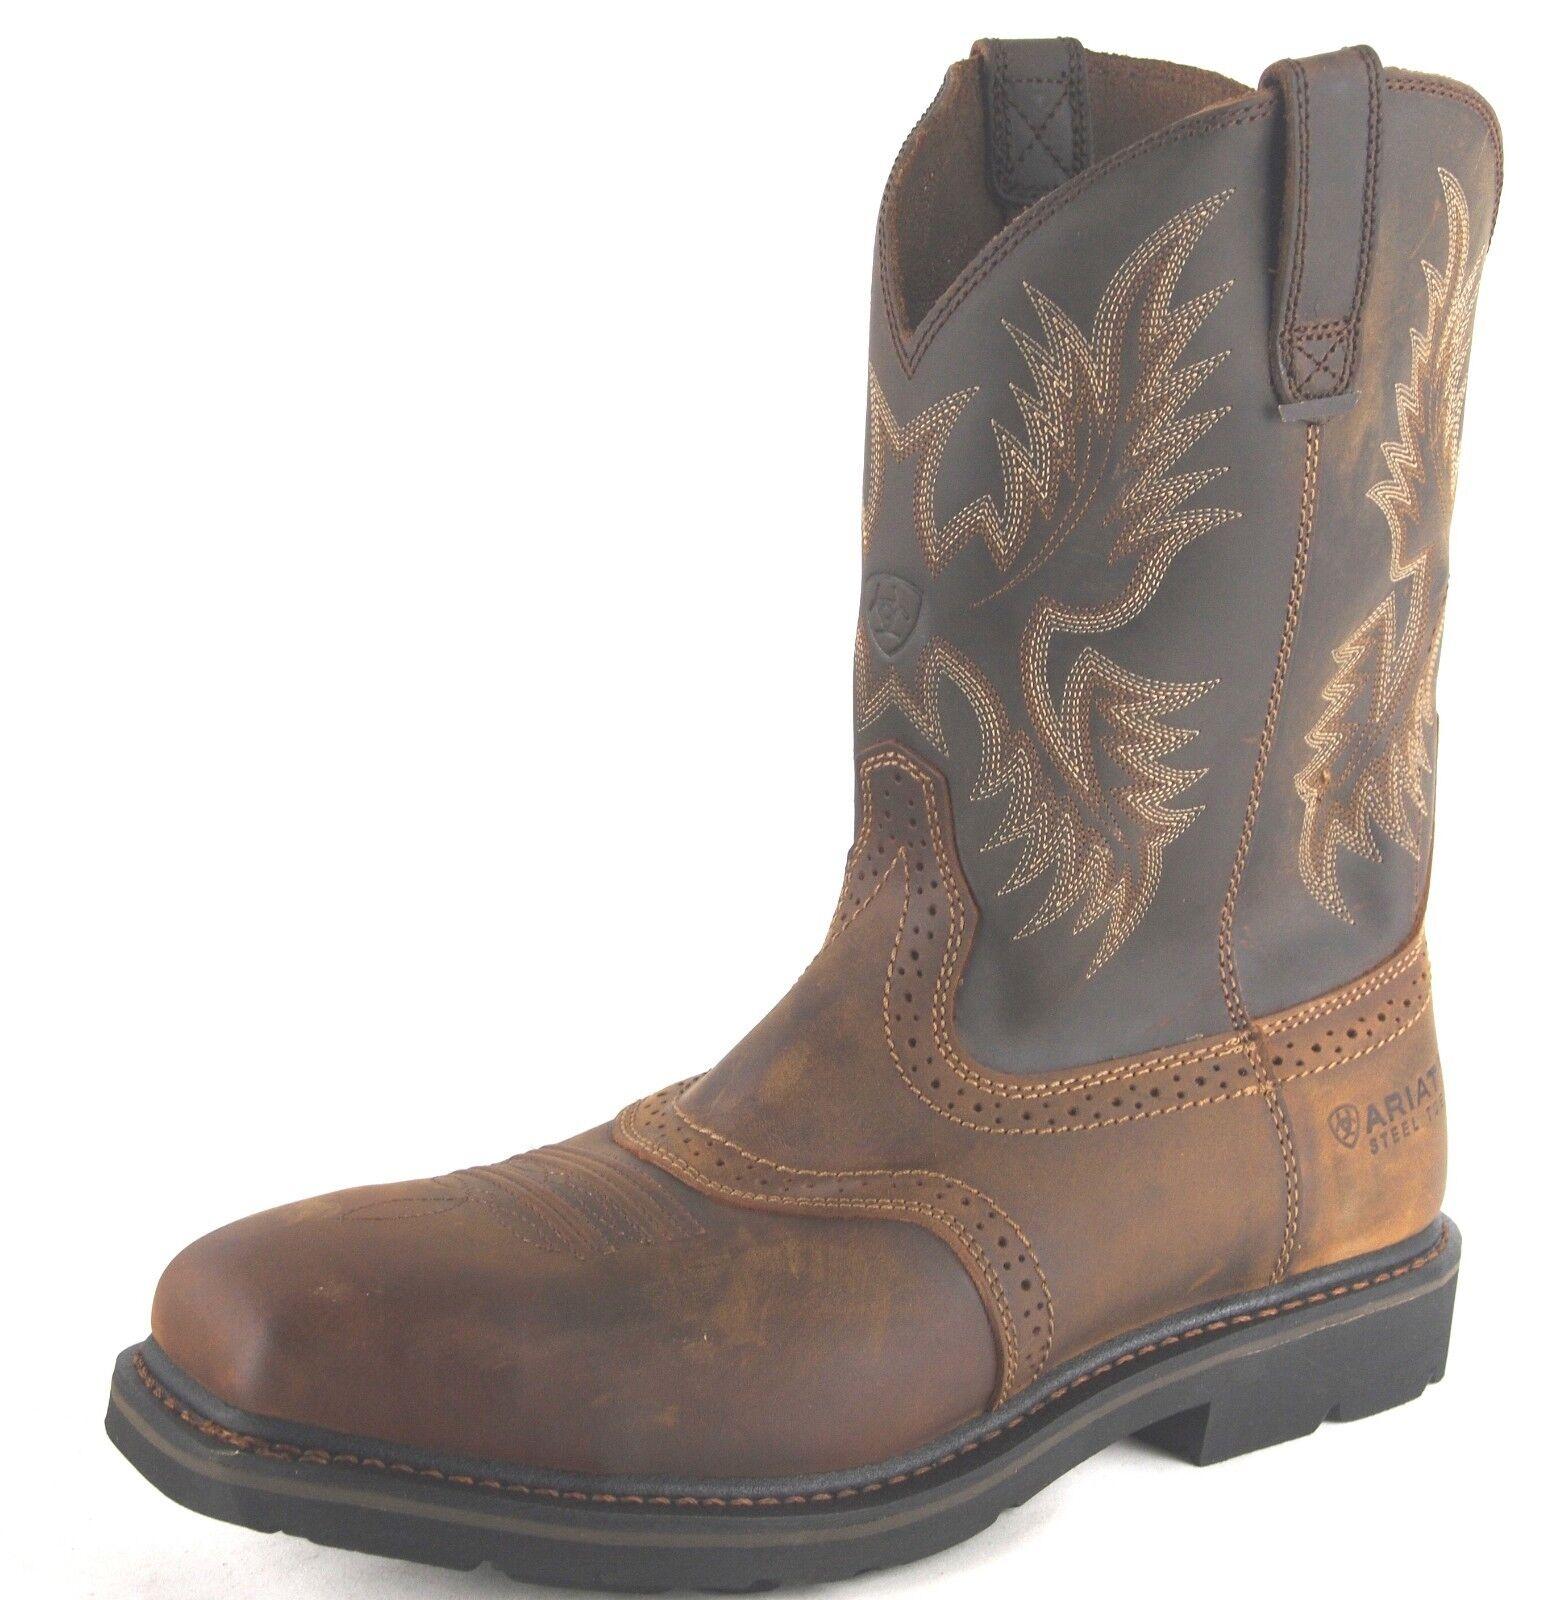 Ariat Mens Sierra Square Toe Steel Toe Safety Work Western bottes 10010134